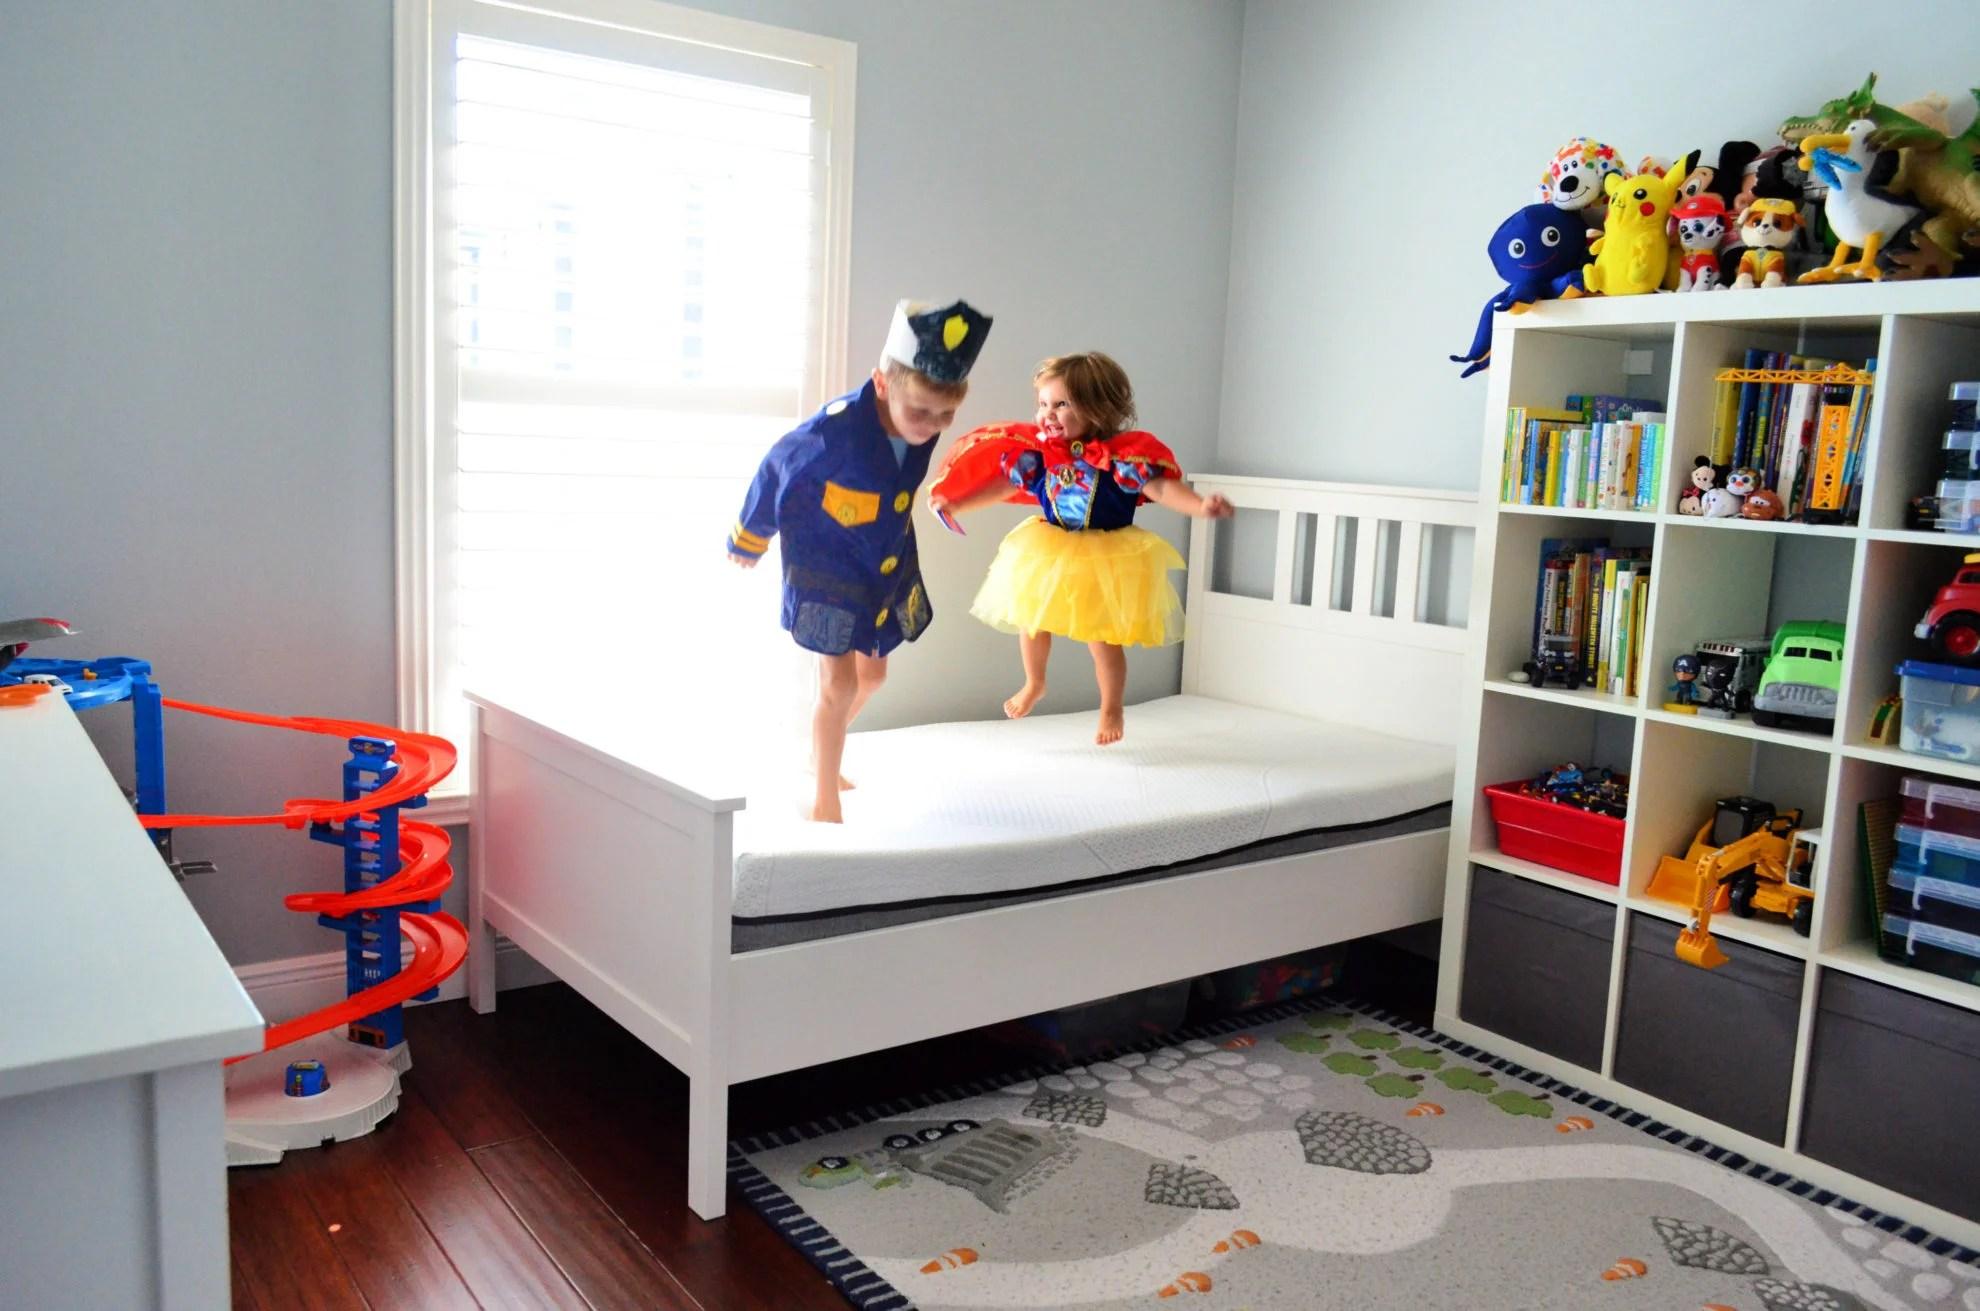 Kids jumping on a Yogabed Mattress